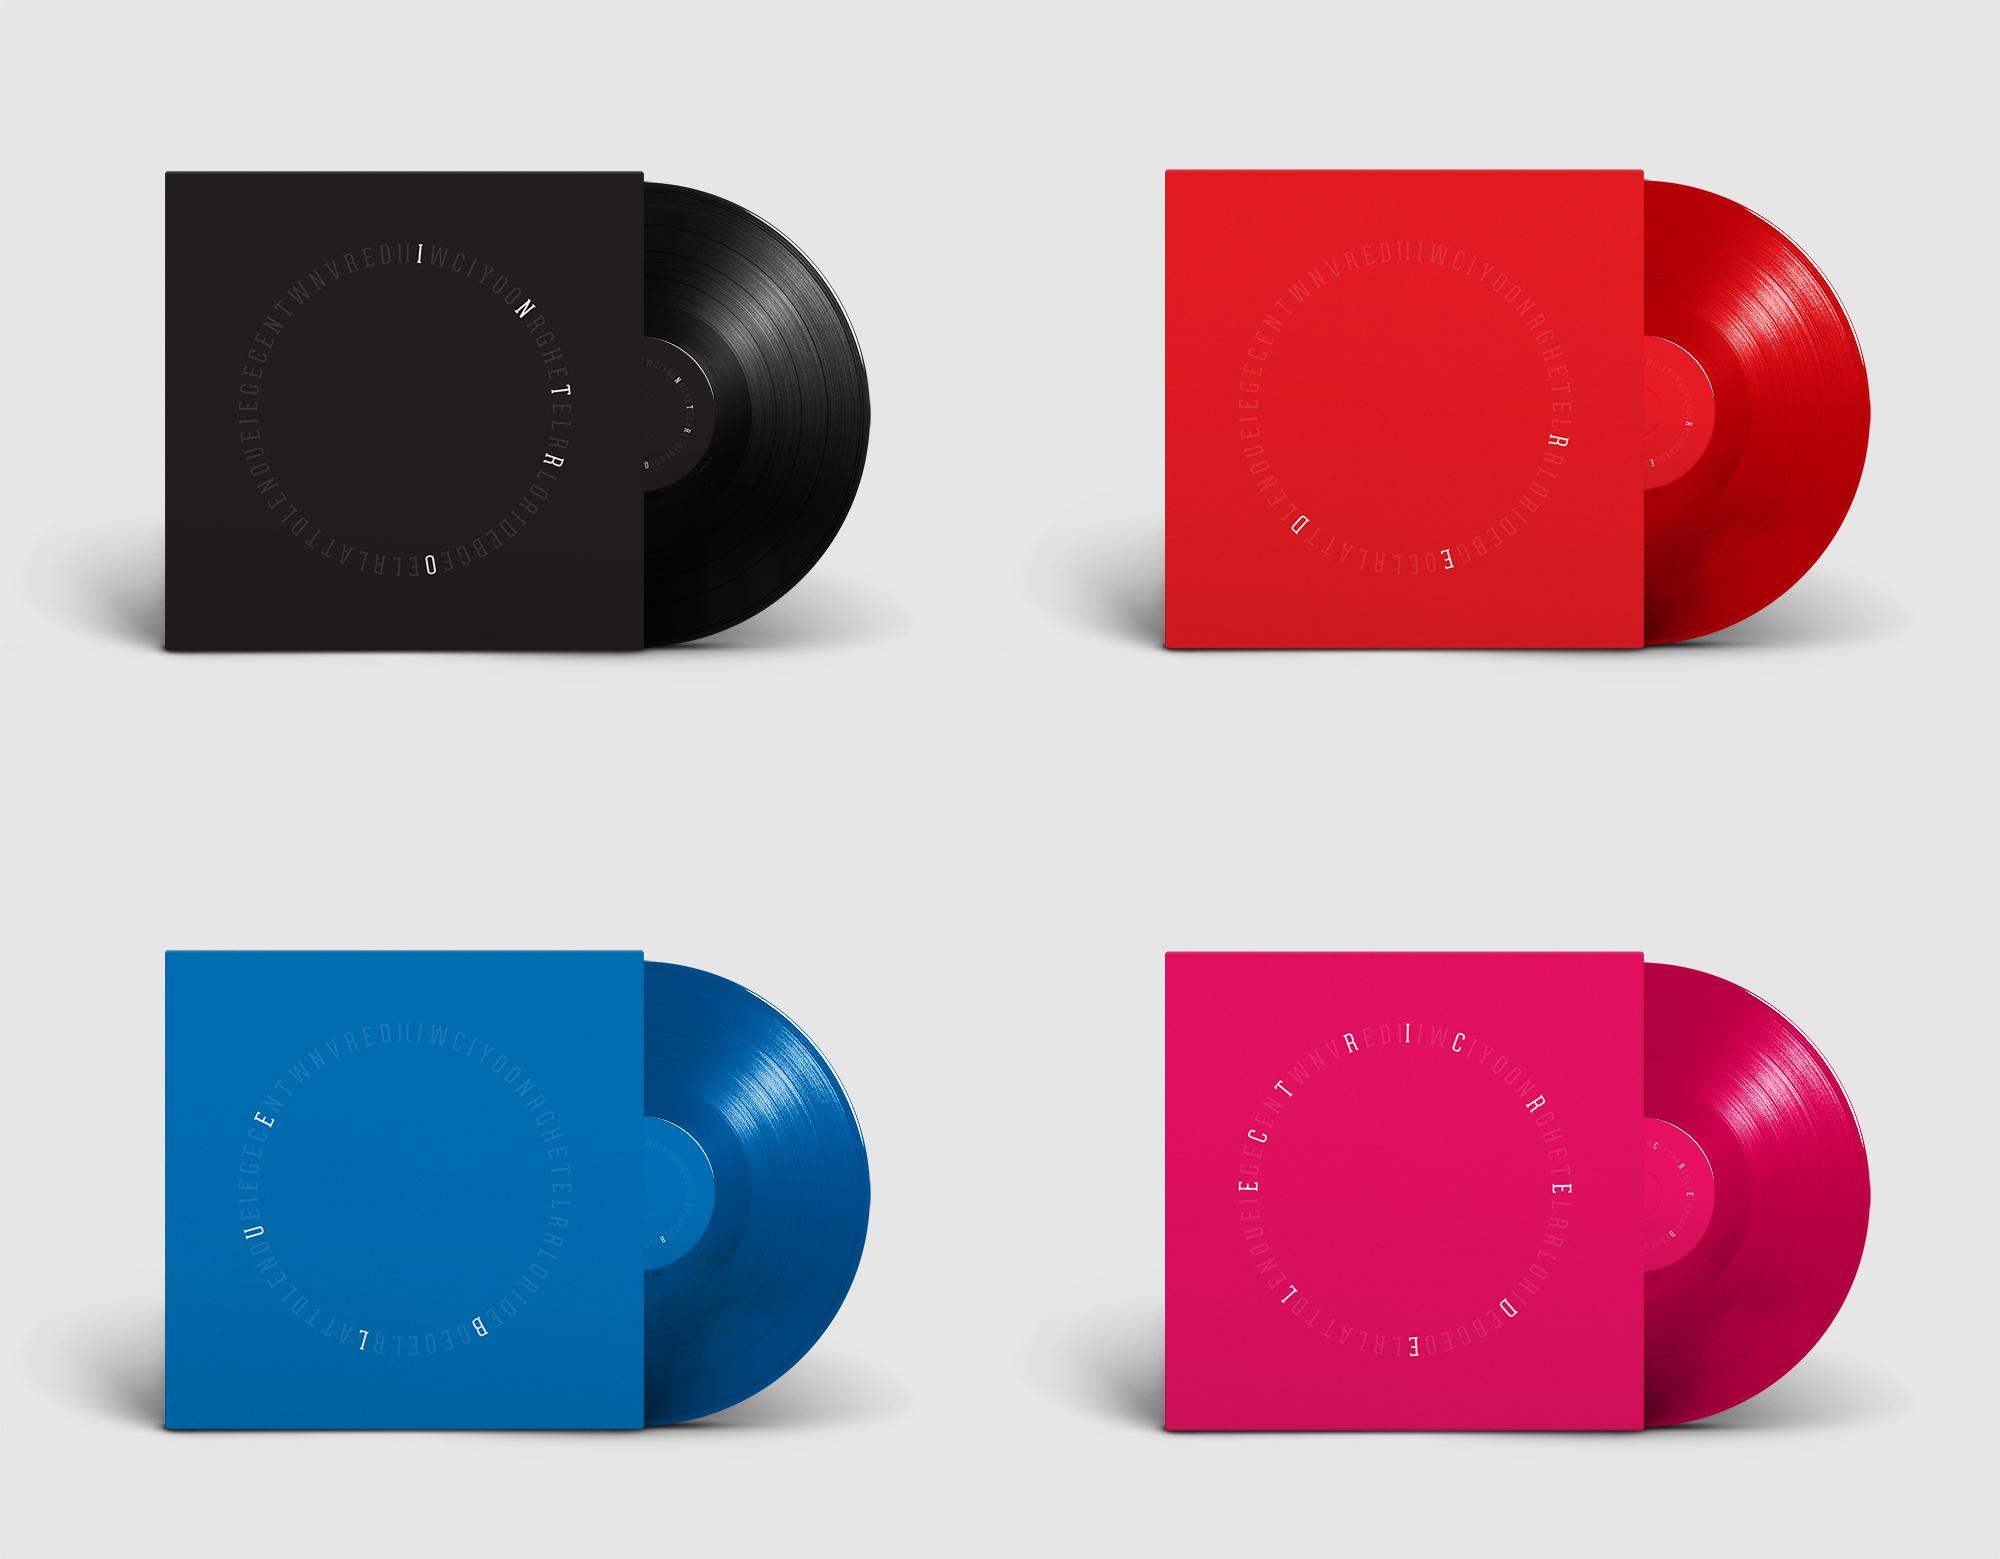 Miles Davis Aura Deluxe Vinyl Box Set - Record Sleeve Design